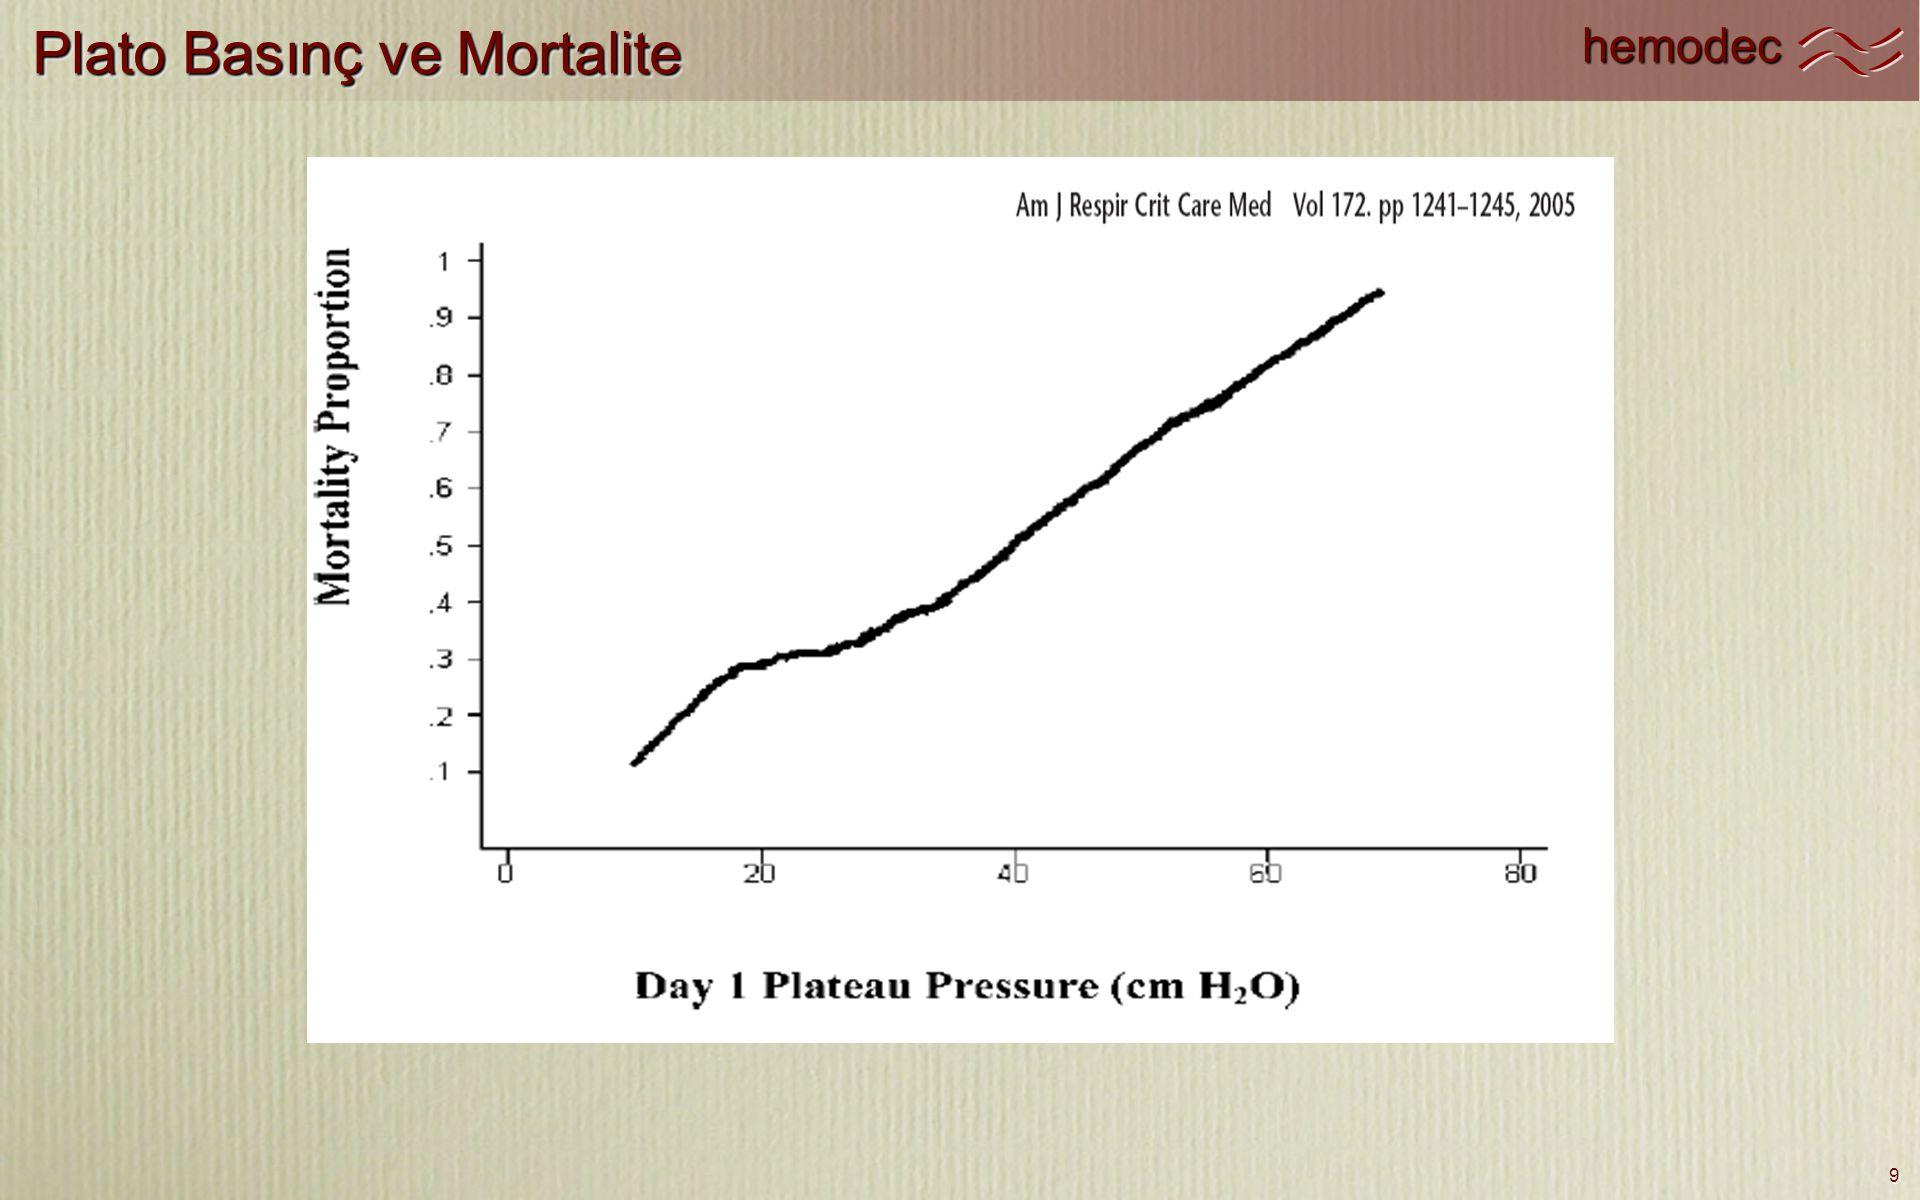 hemodec 9 Plato Basınç ve Mortalite